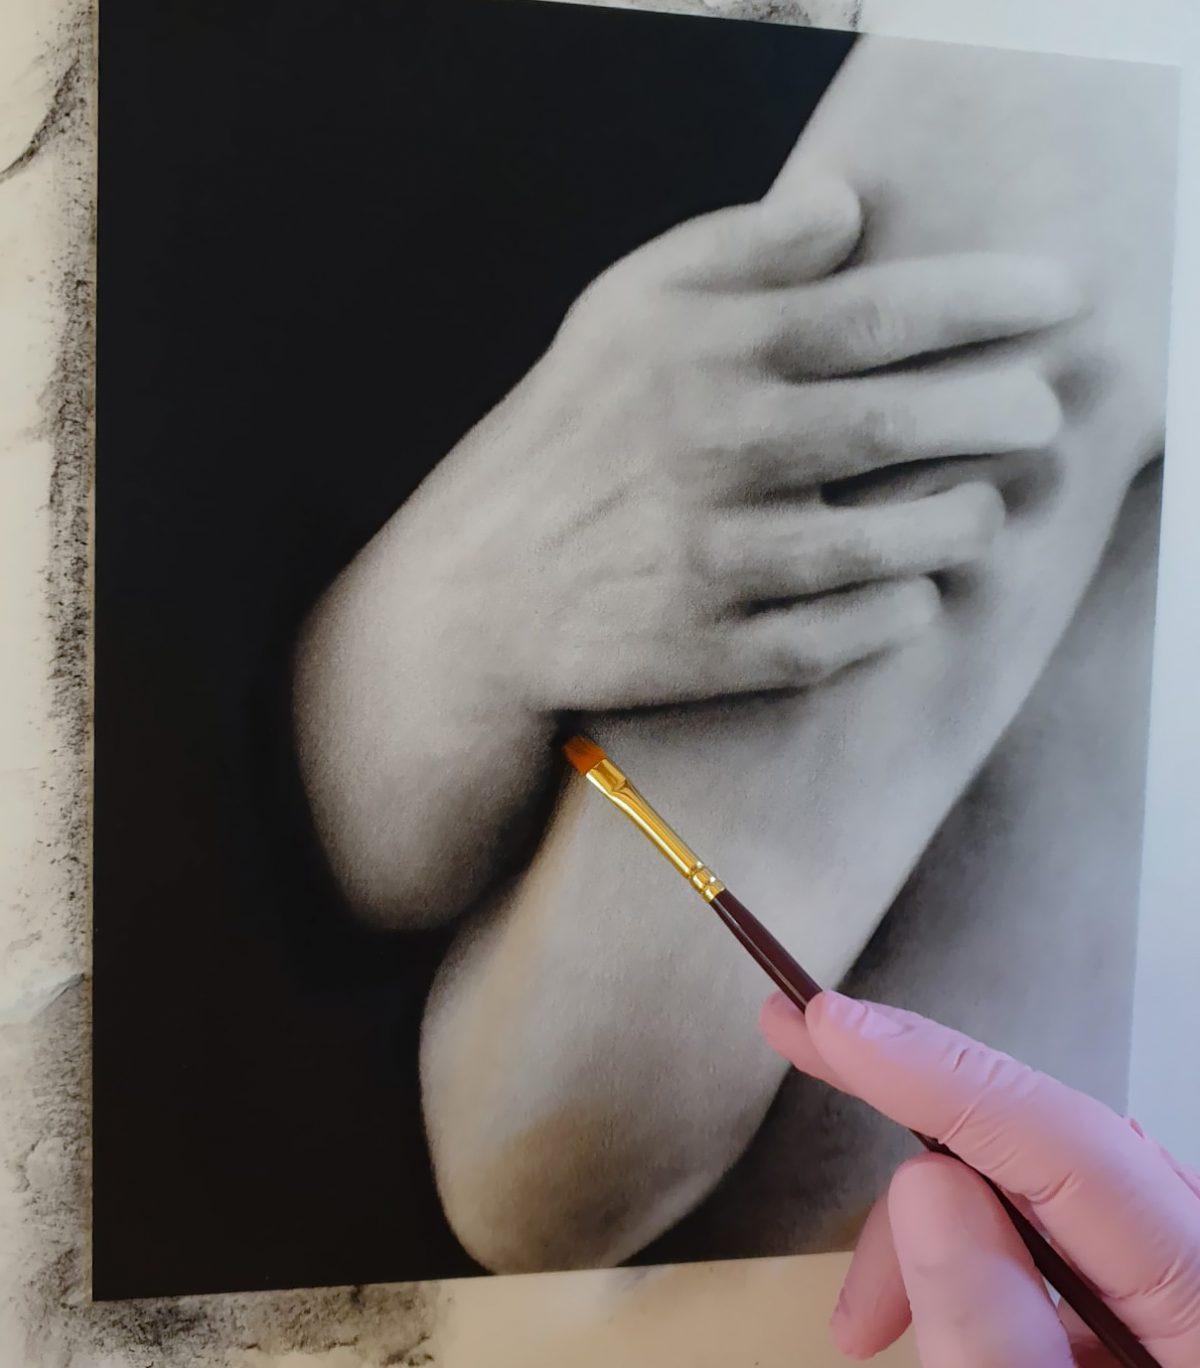 Körper, Jana Geilhof, Ölgemälde, Figurative, Kunst, Malerei, Gemälde, Kunstwerk, Ölmalerei